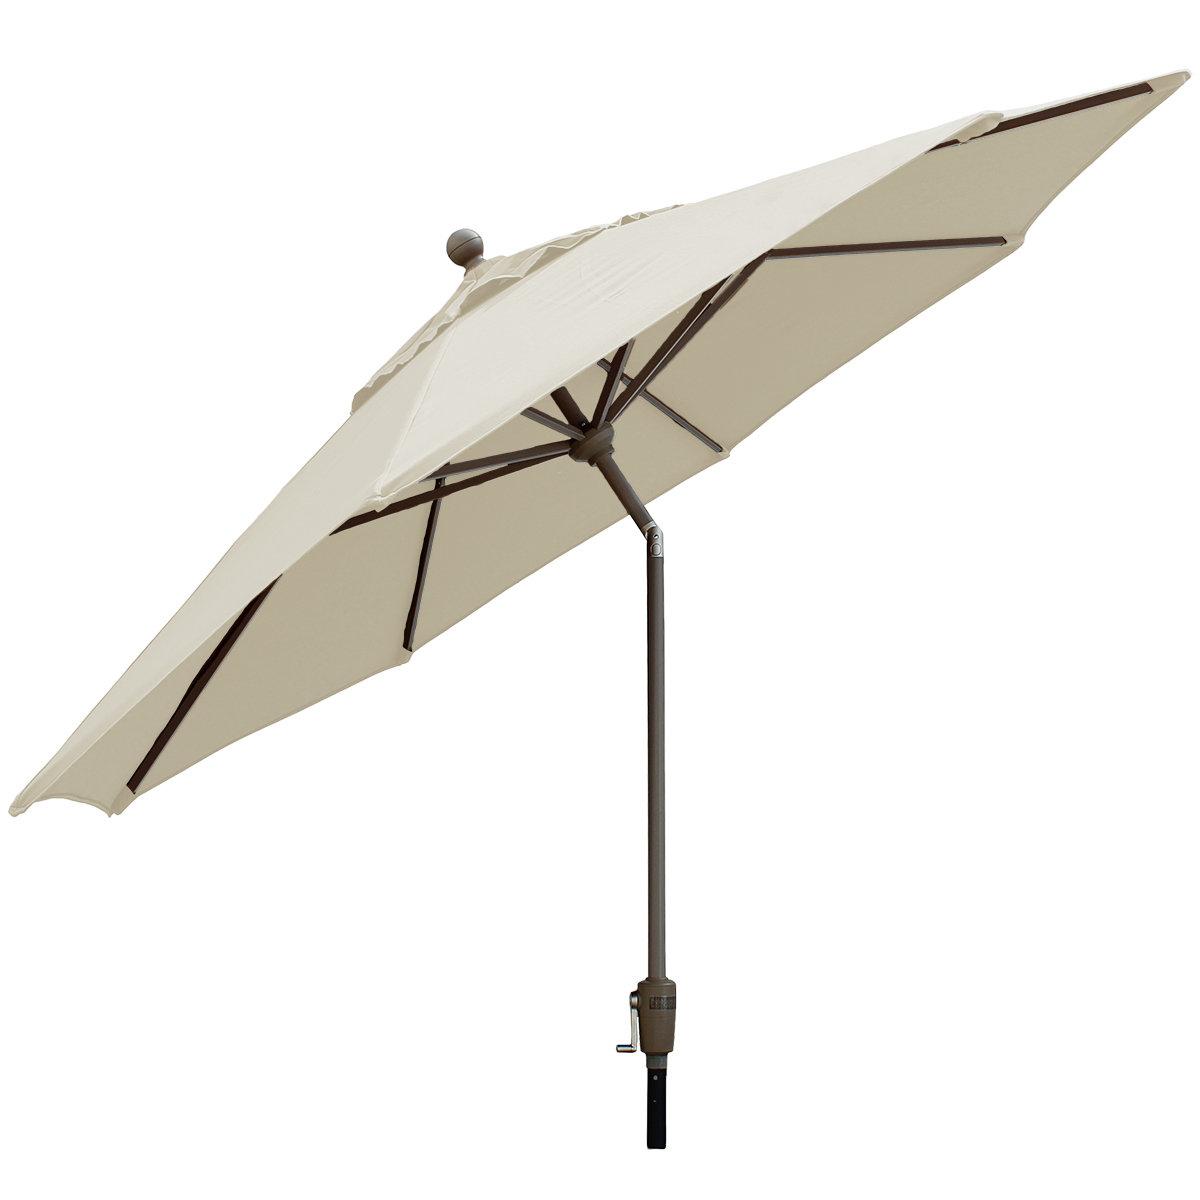 2019 Crowland 9' Market Sunbrella Umbrella Within Mullaney Market Sunbrella Umbrellas (View 19 of 20)